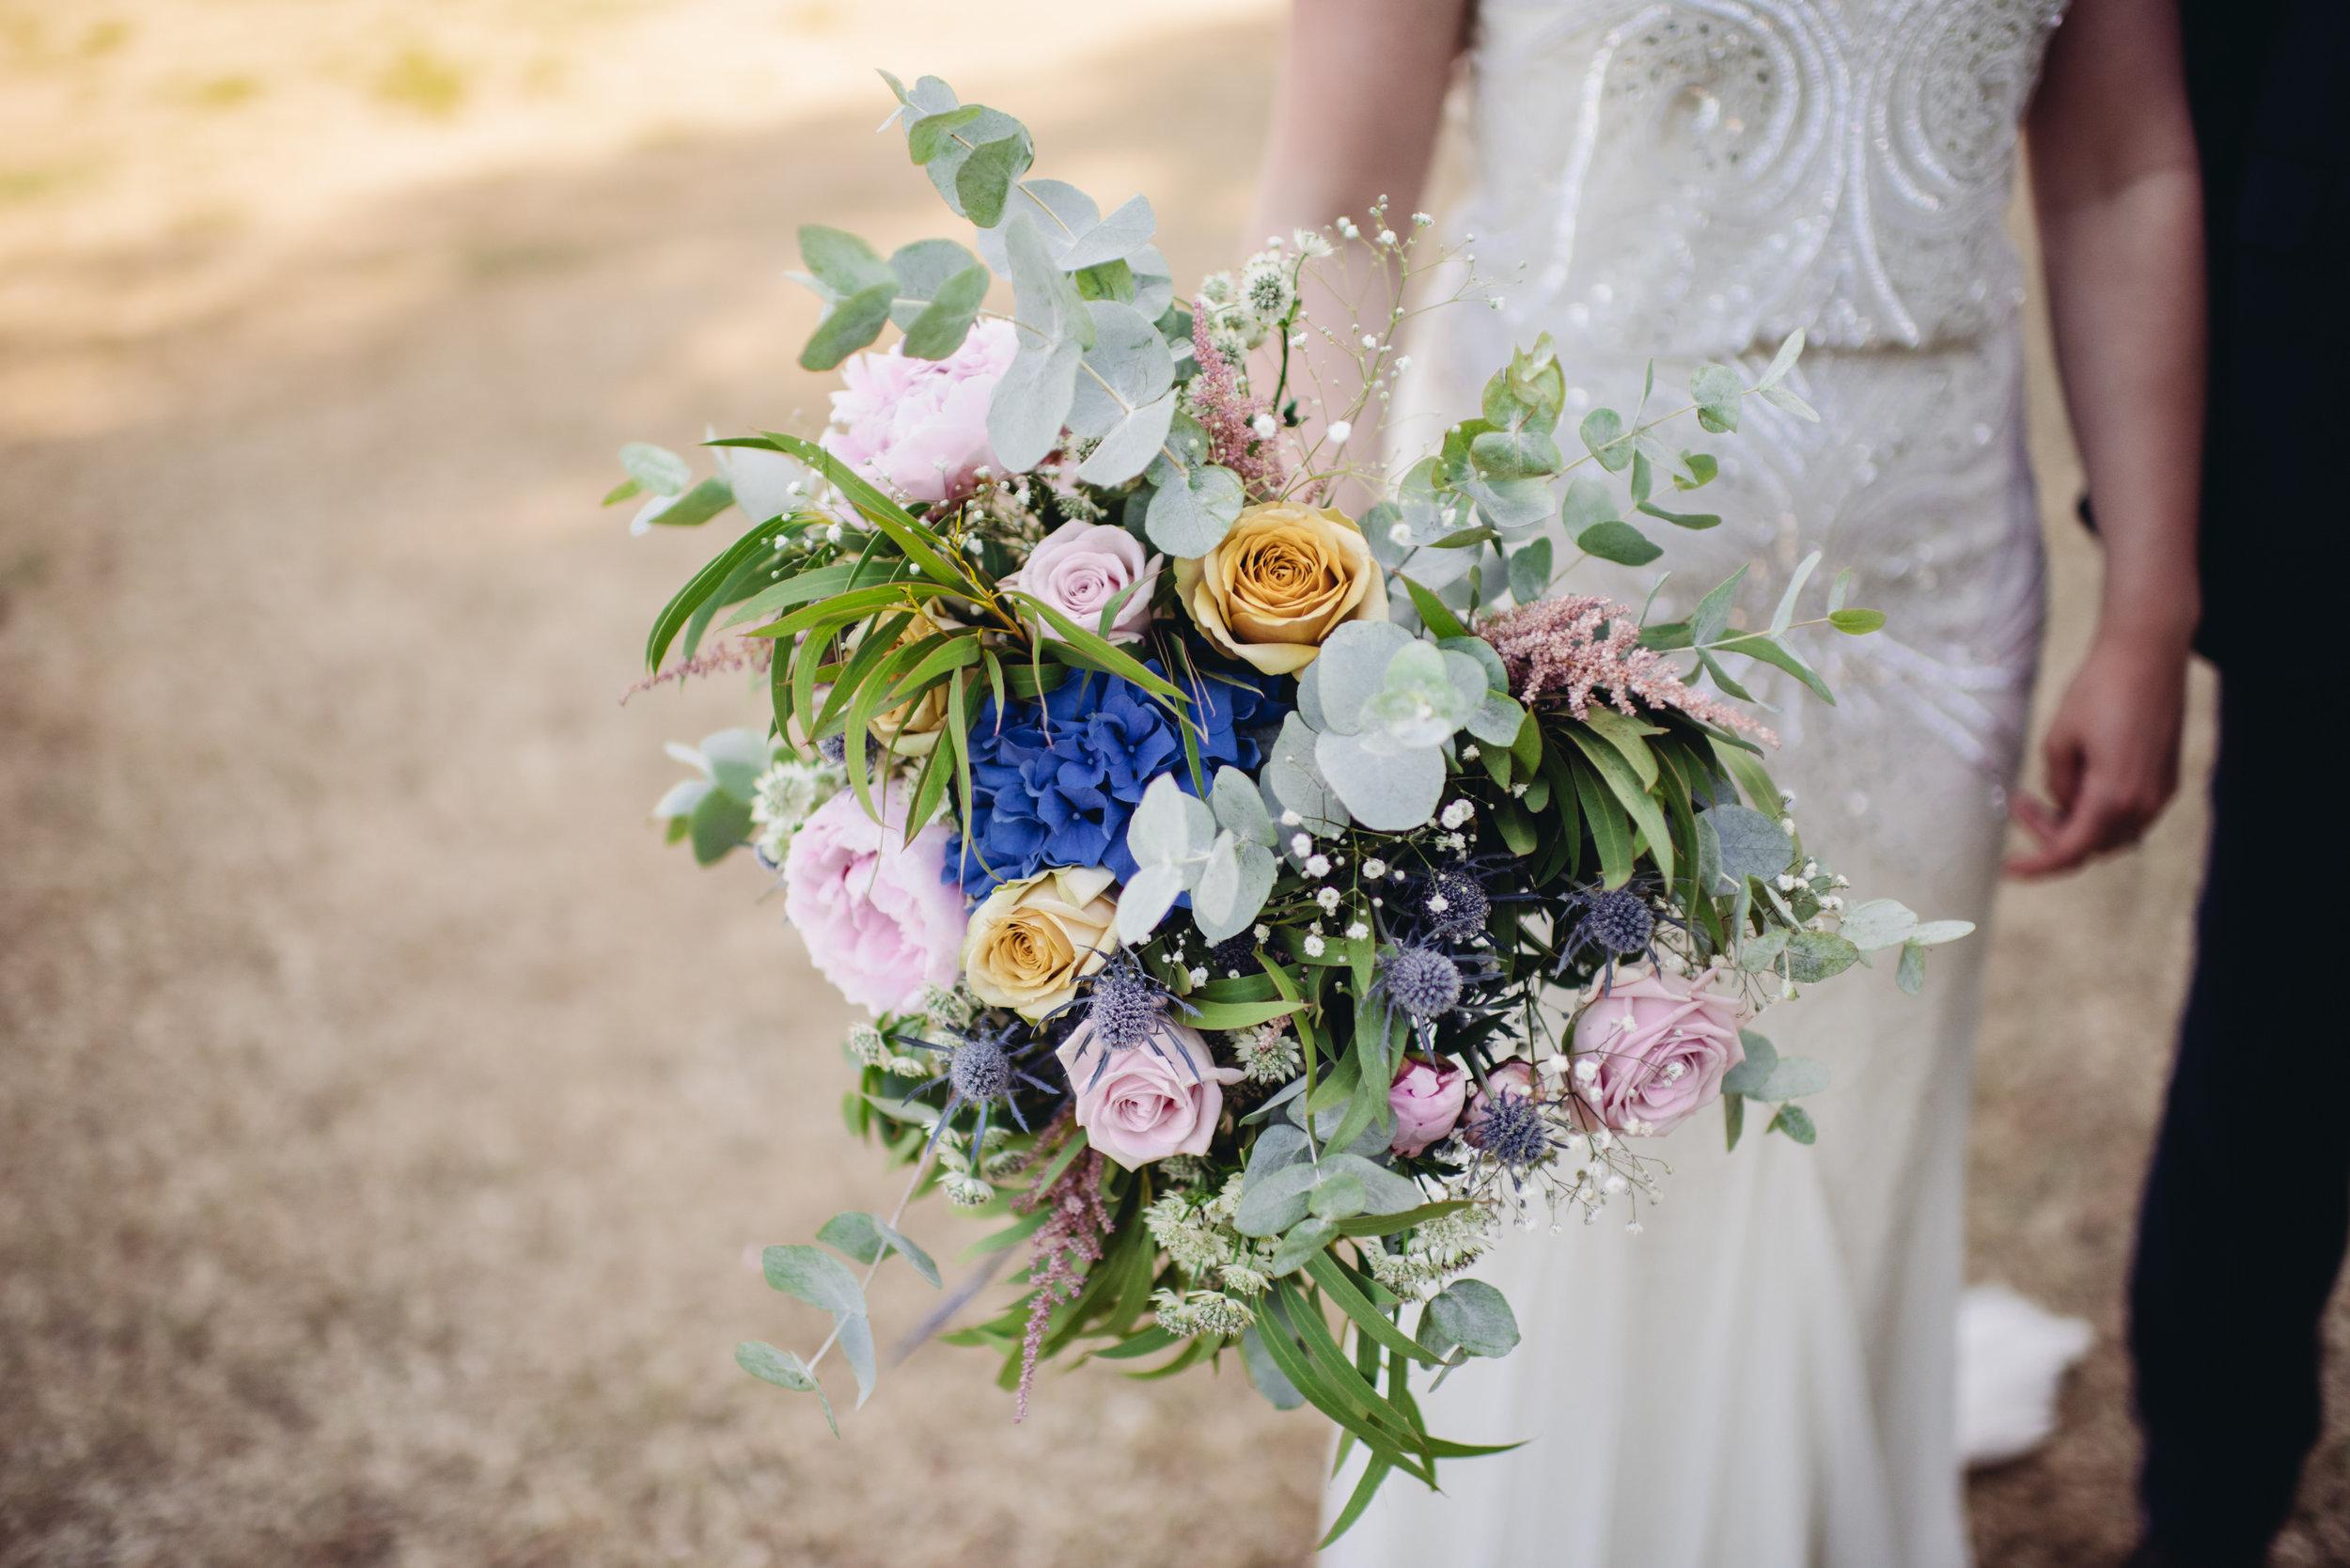 0228-LISA-DEVINE-PHOTOGRAPHY-ALTERNATIVE-WEDDING-PHOTOGRAPHY-SCOTLAND-DESTINATION-WEDDINGS-GLASGOW-WEDDINGS-COOL-WEDDINGS-STYLISH-WEDDINGS.JPG